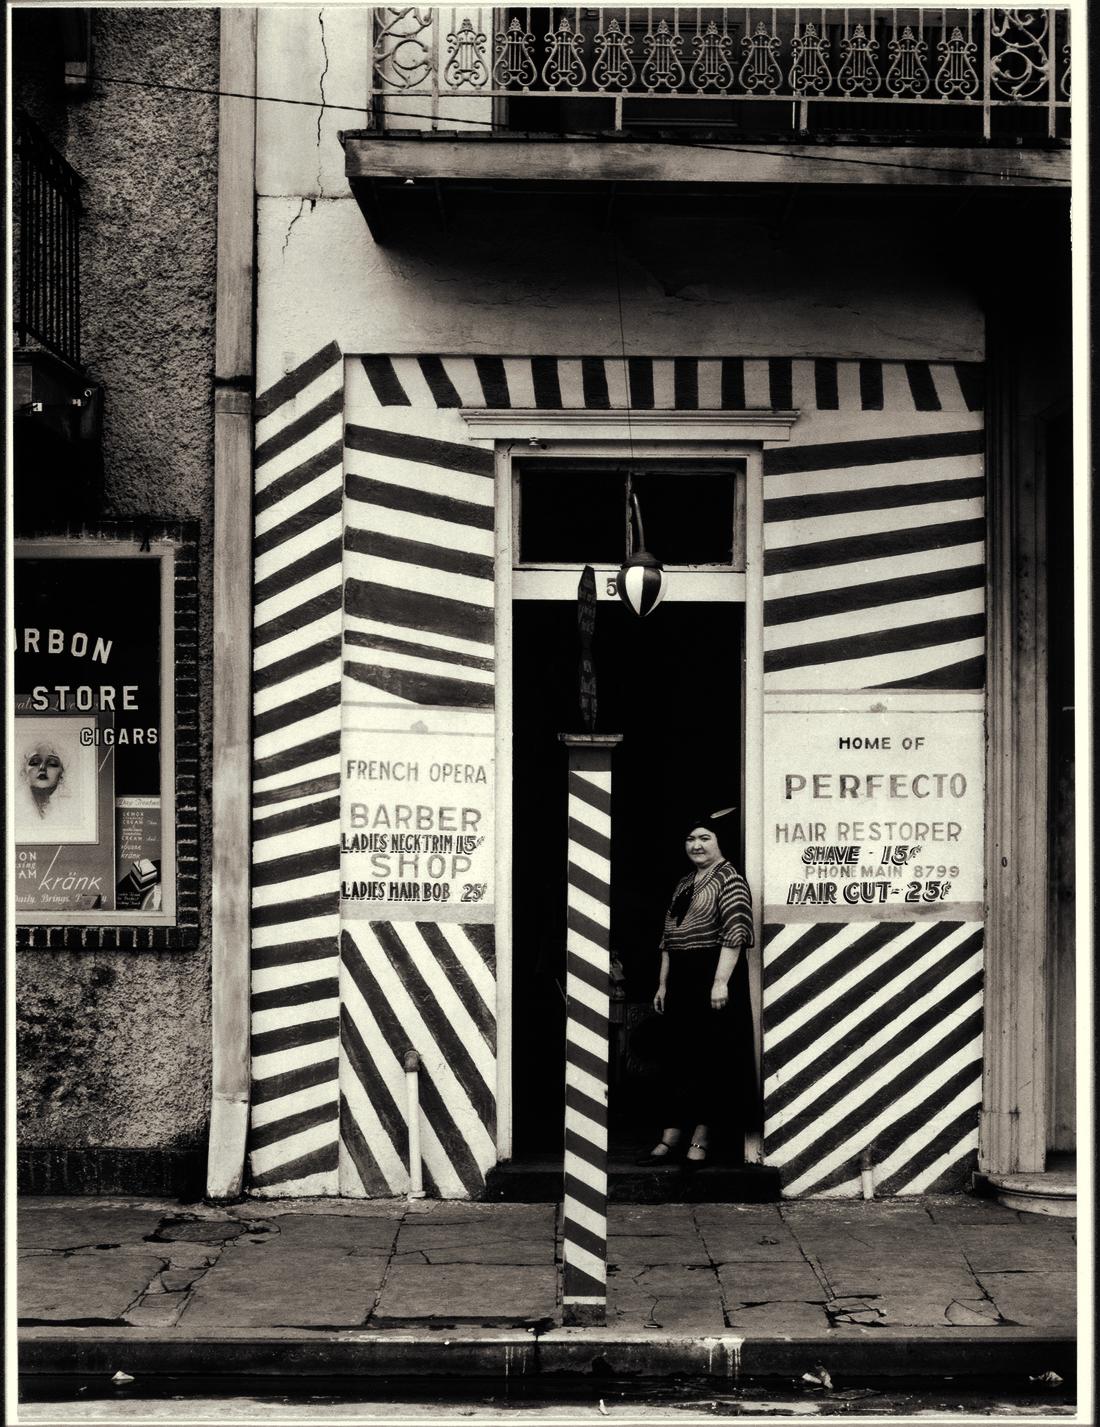 Walker Evans, Sidewalk and Shopfront, New Orleans, 1935. © Walker Evans Archive, The Metropolitan Museum of Art, New York. Courtesy of SFMOMA.